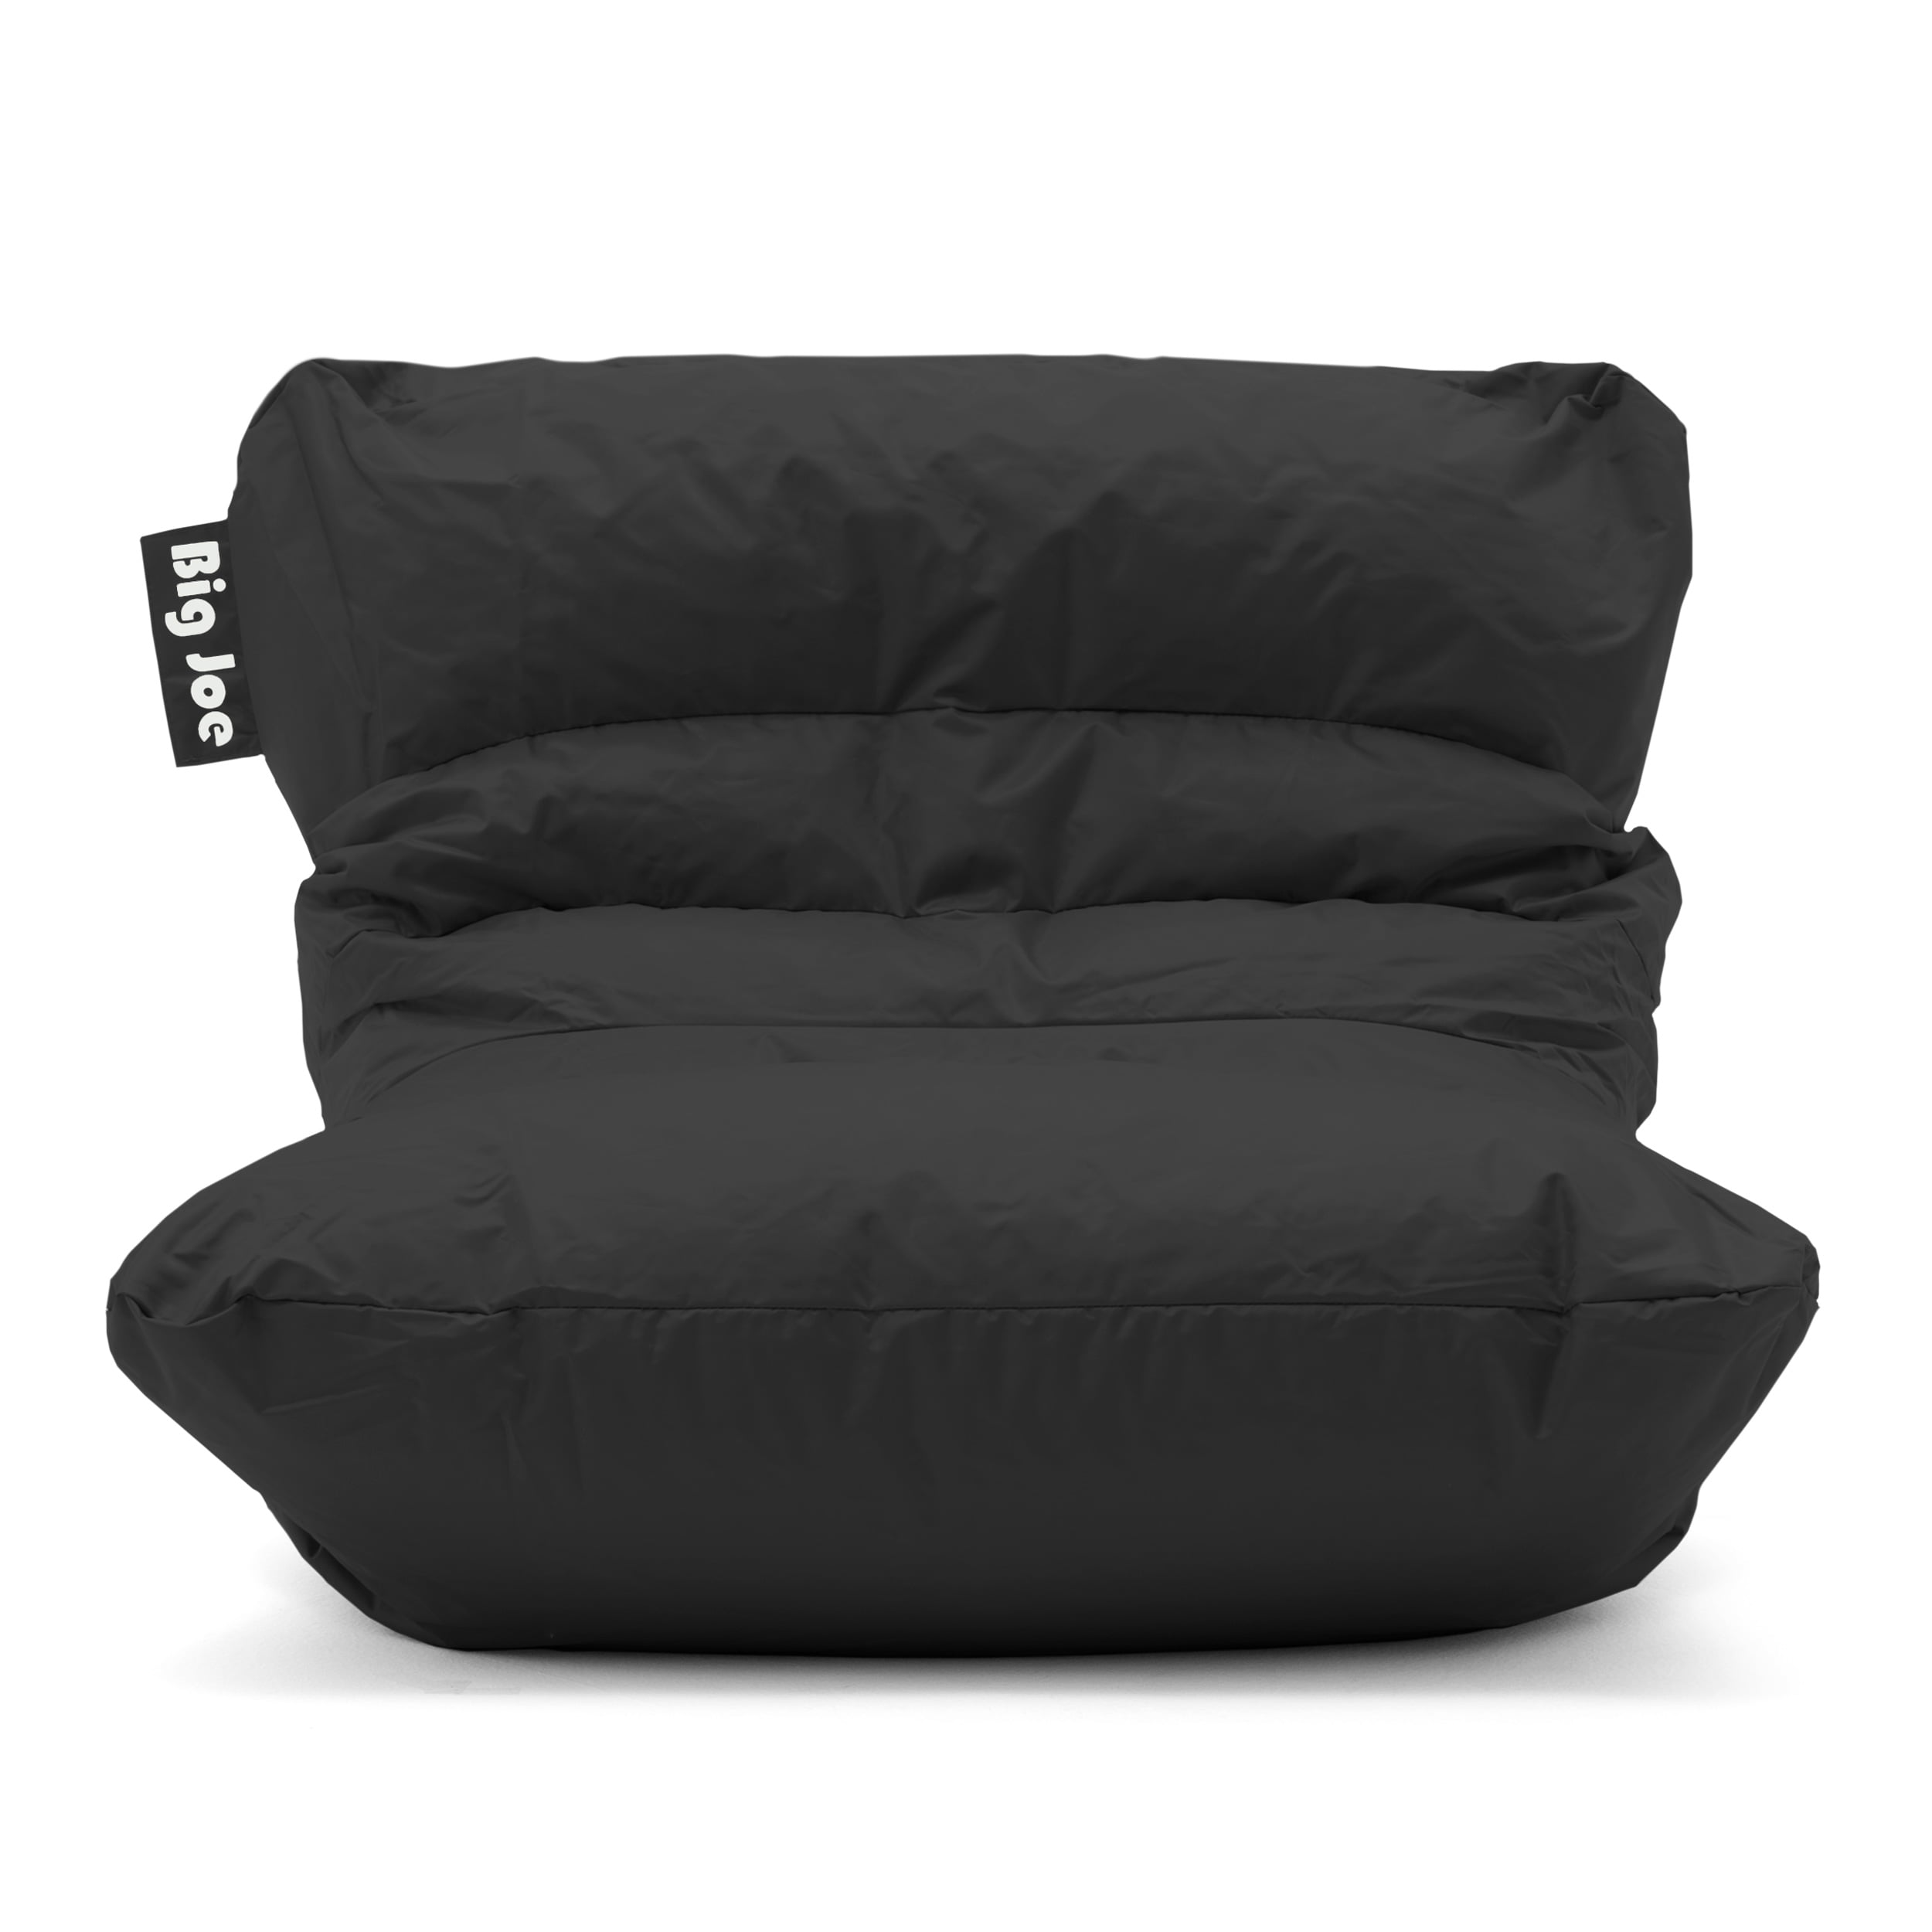 Cool Big Joe Roma Floor Bean Bag Chair Multiple Colors Fabrics Beatyapartments Chair Design Images Beatyapartmentscom